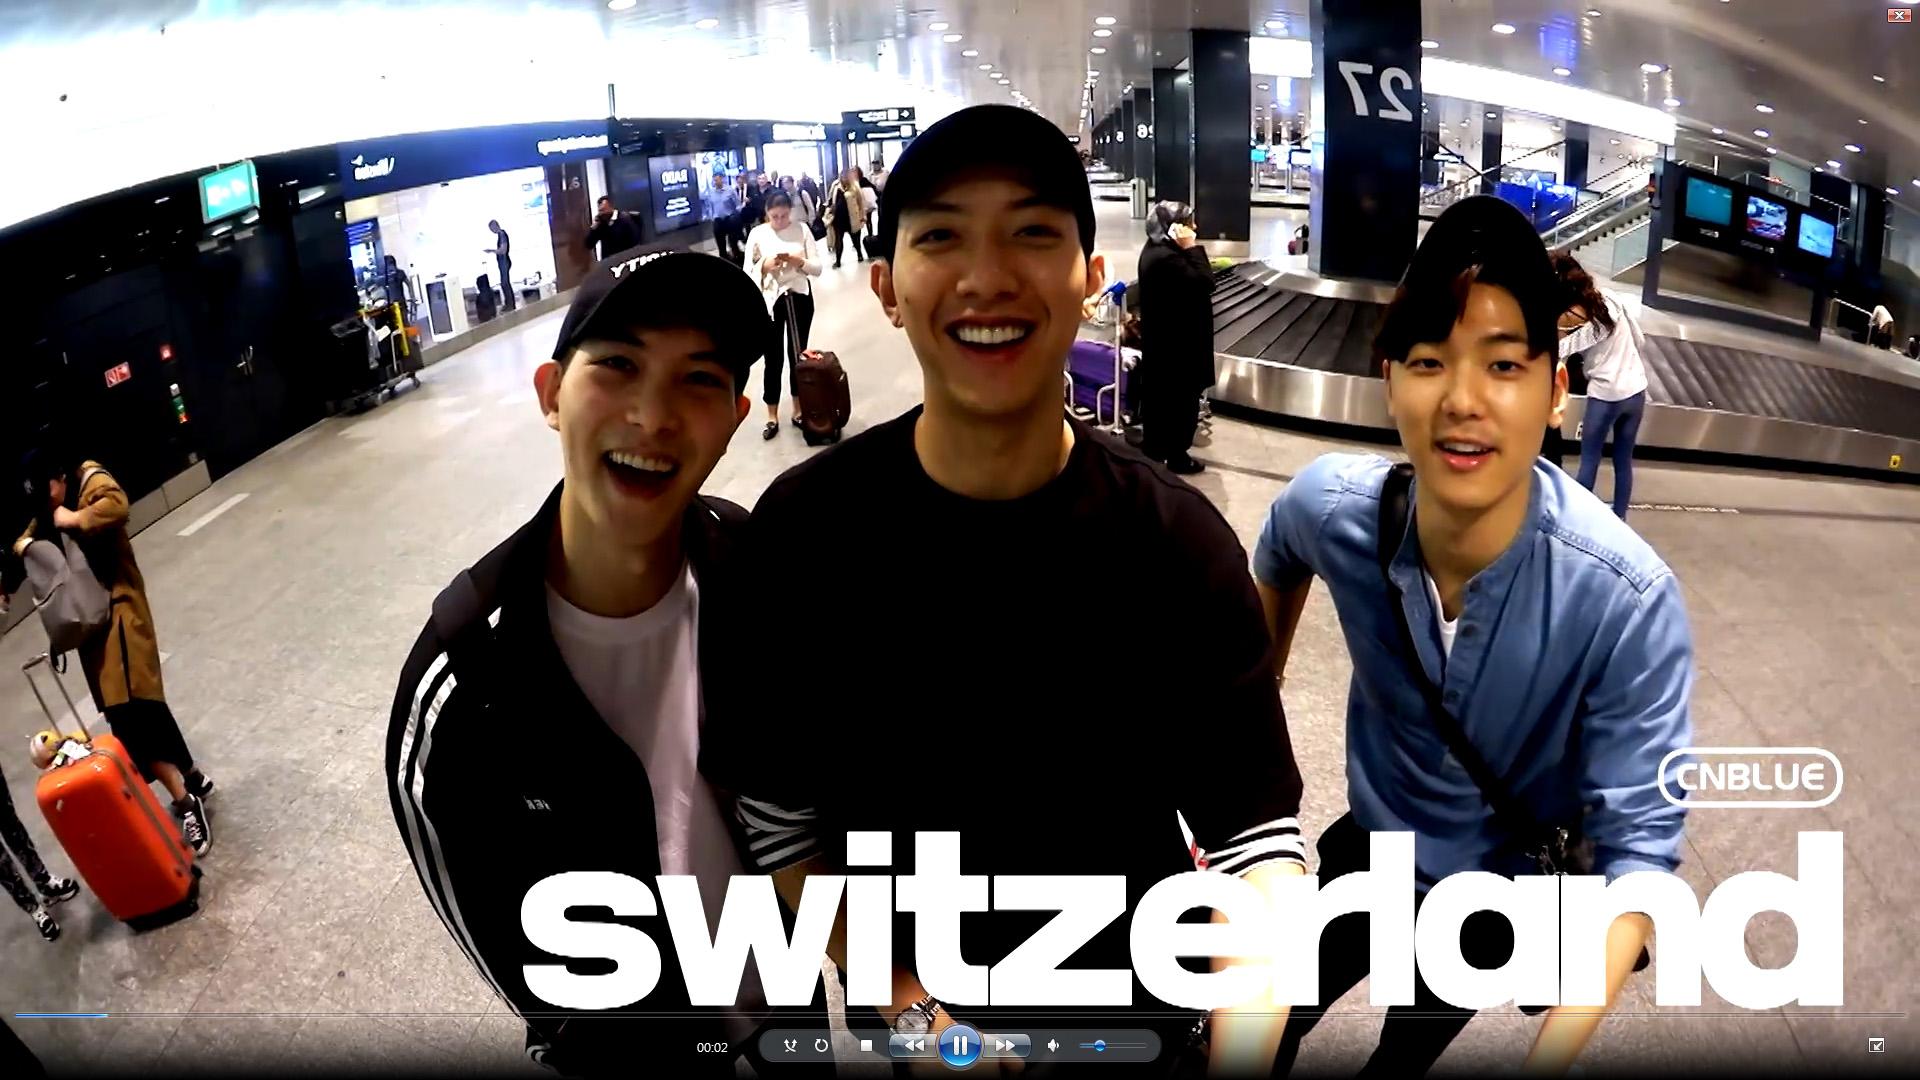 'CNBLUE, 스위스와 사랑에 빠지다' 티저영상 오늘 공개, 본영상 공개는 21일부터!